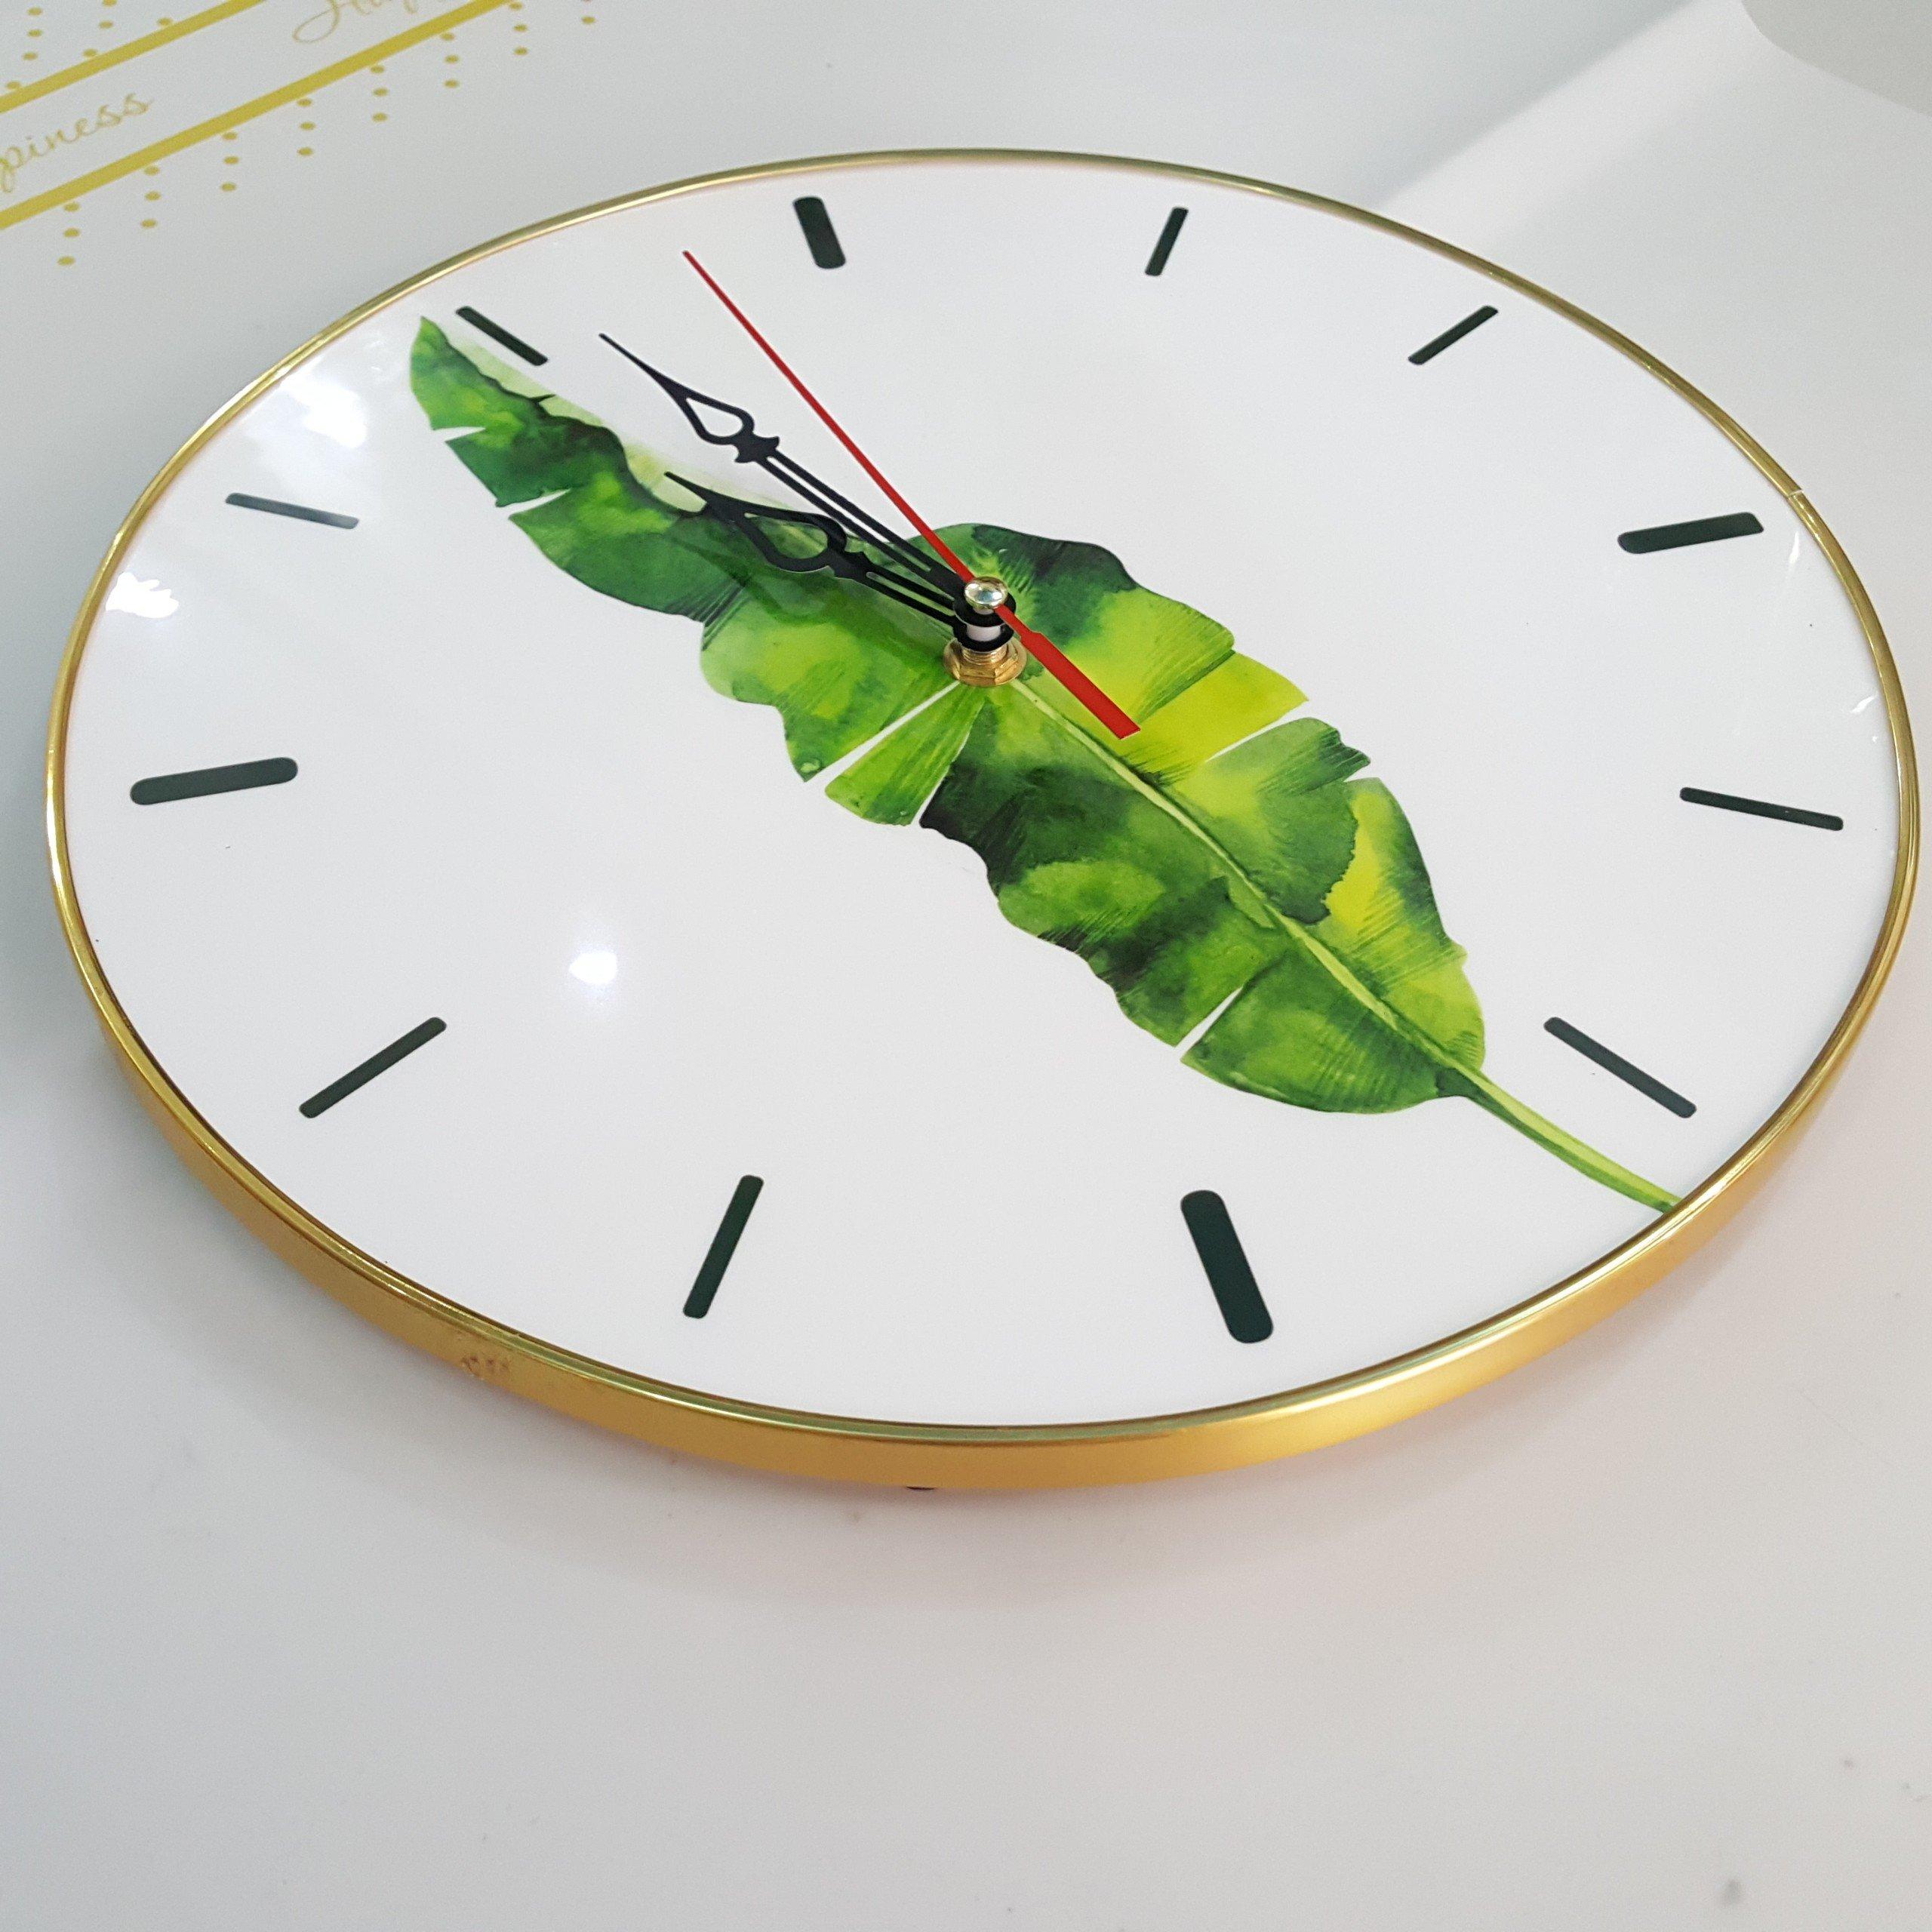 Đồng hồ vintage lá xanh 2